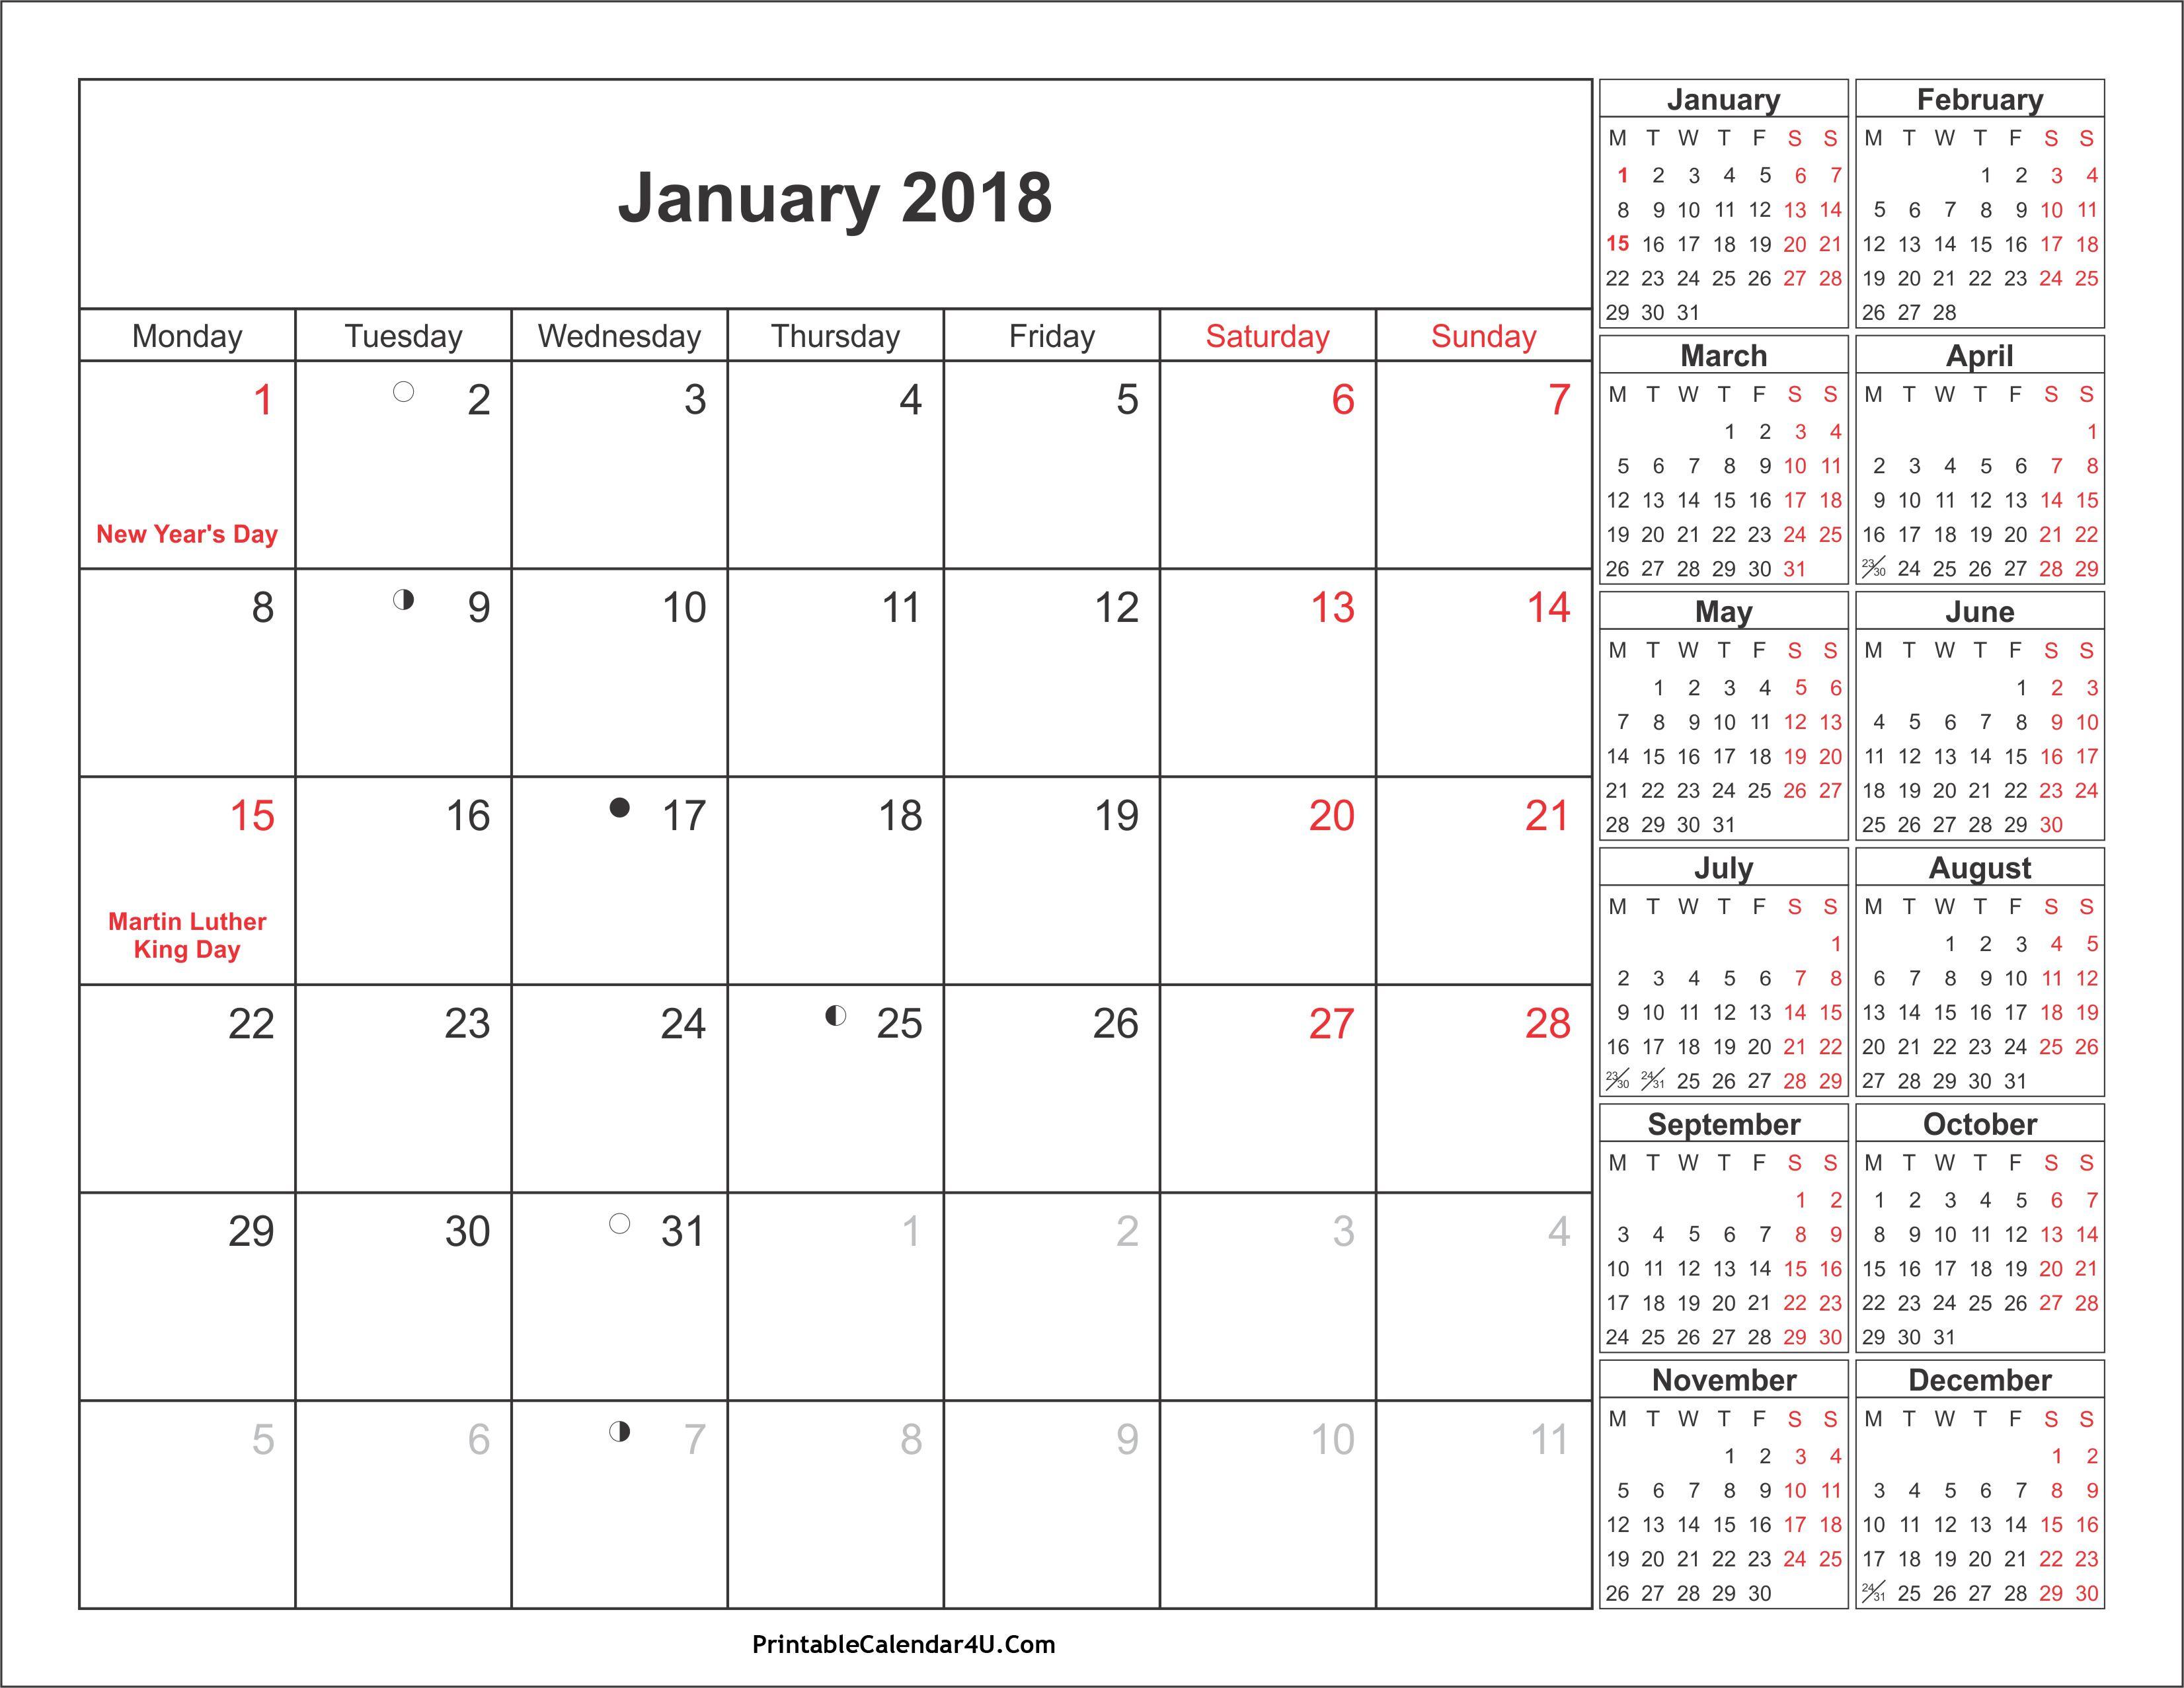 january 2018 calendar printable with holidays pdf and